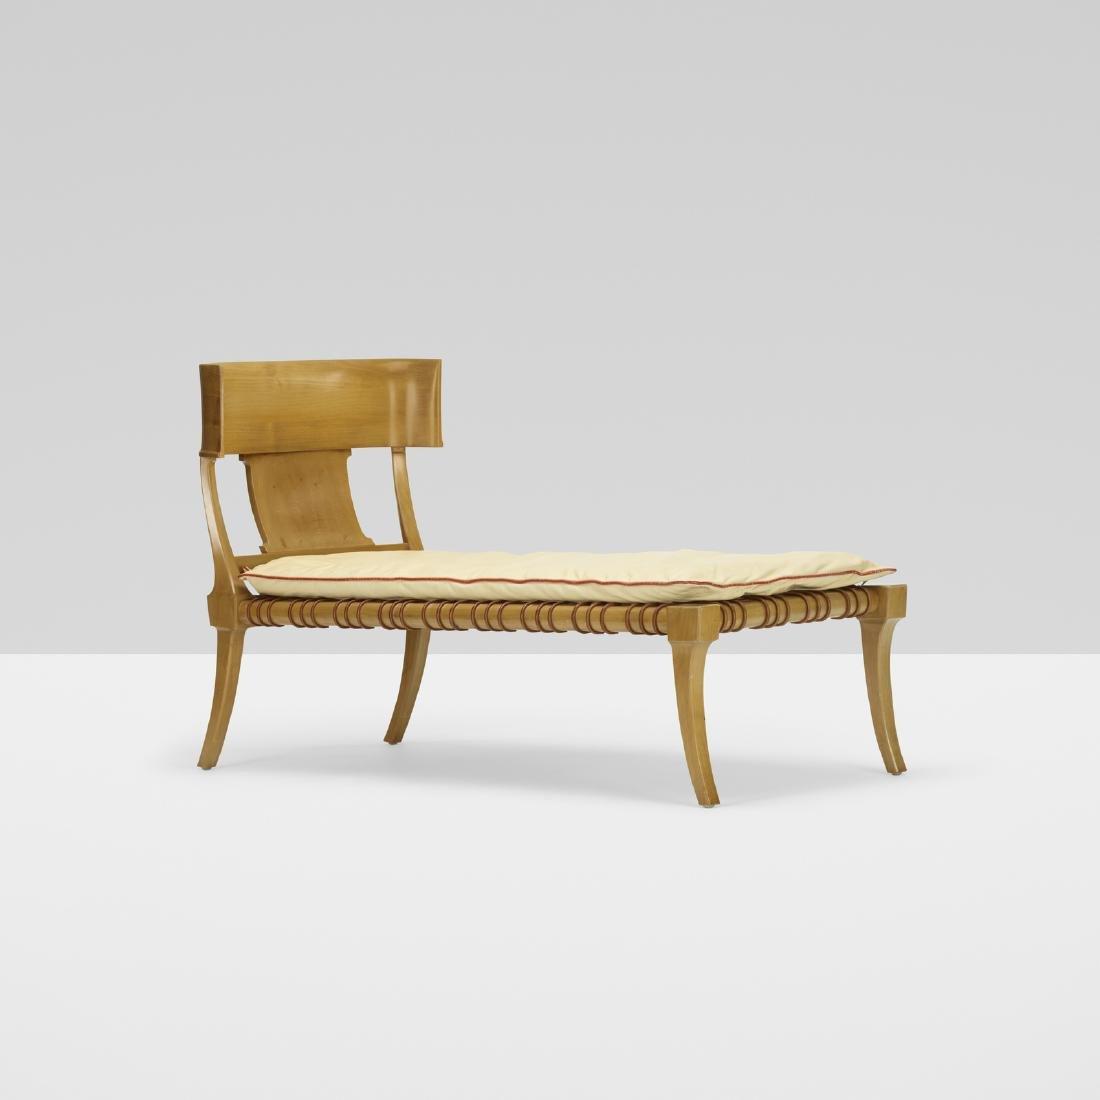 T.H. Robsjohn-Gibbings, Klini chaise, model no. 11